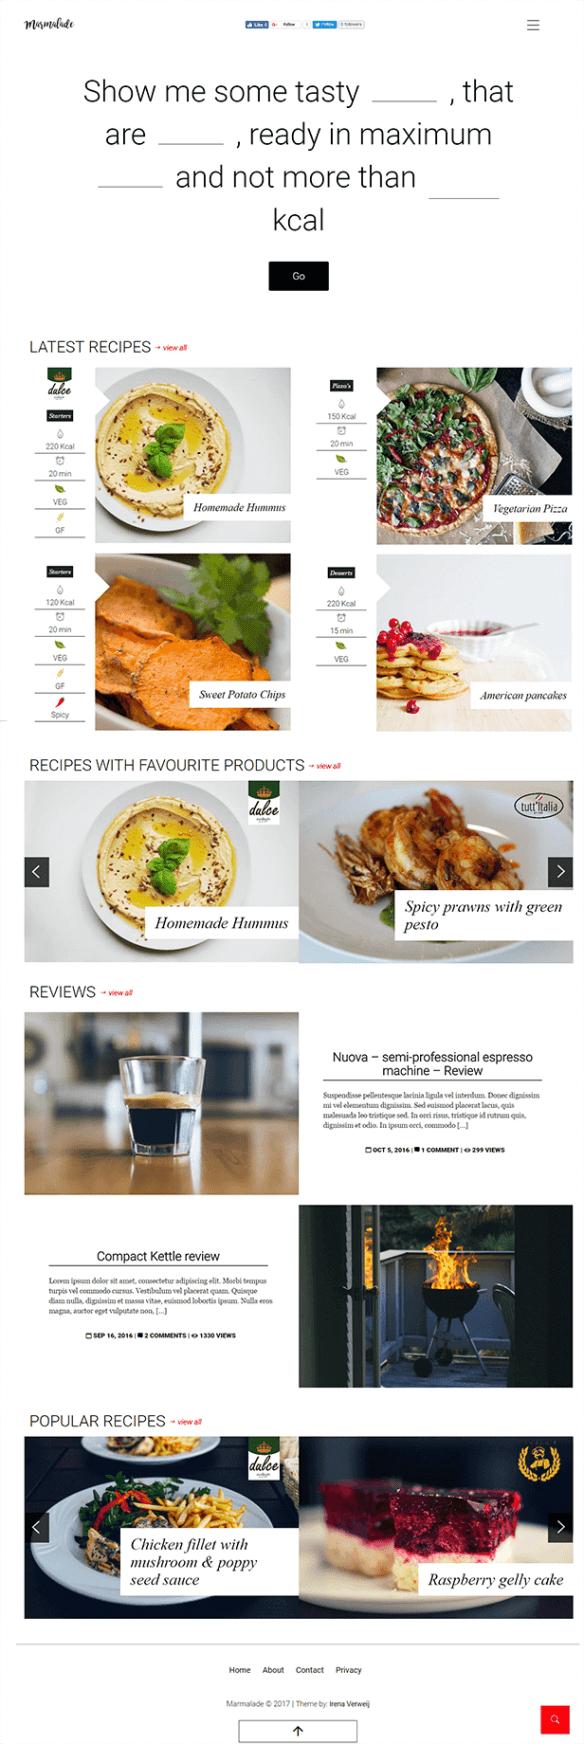 Marmalade - Modern Food Blog theme for WordPress